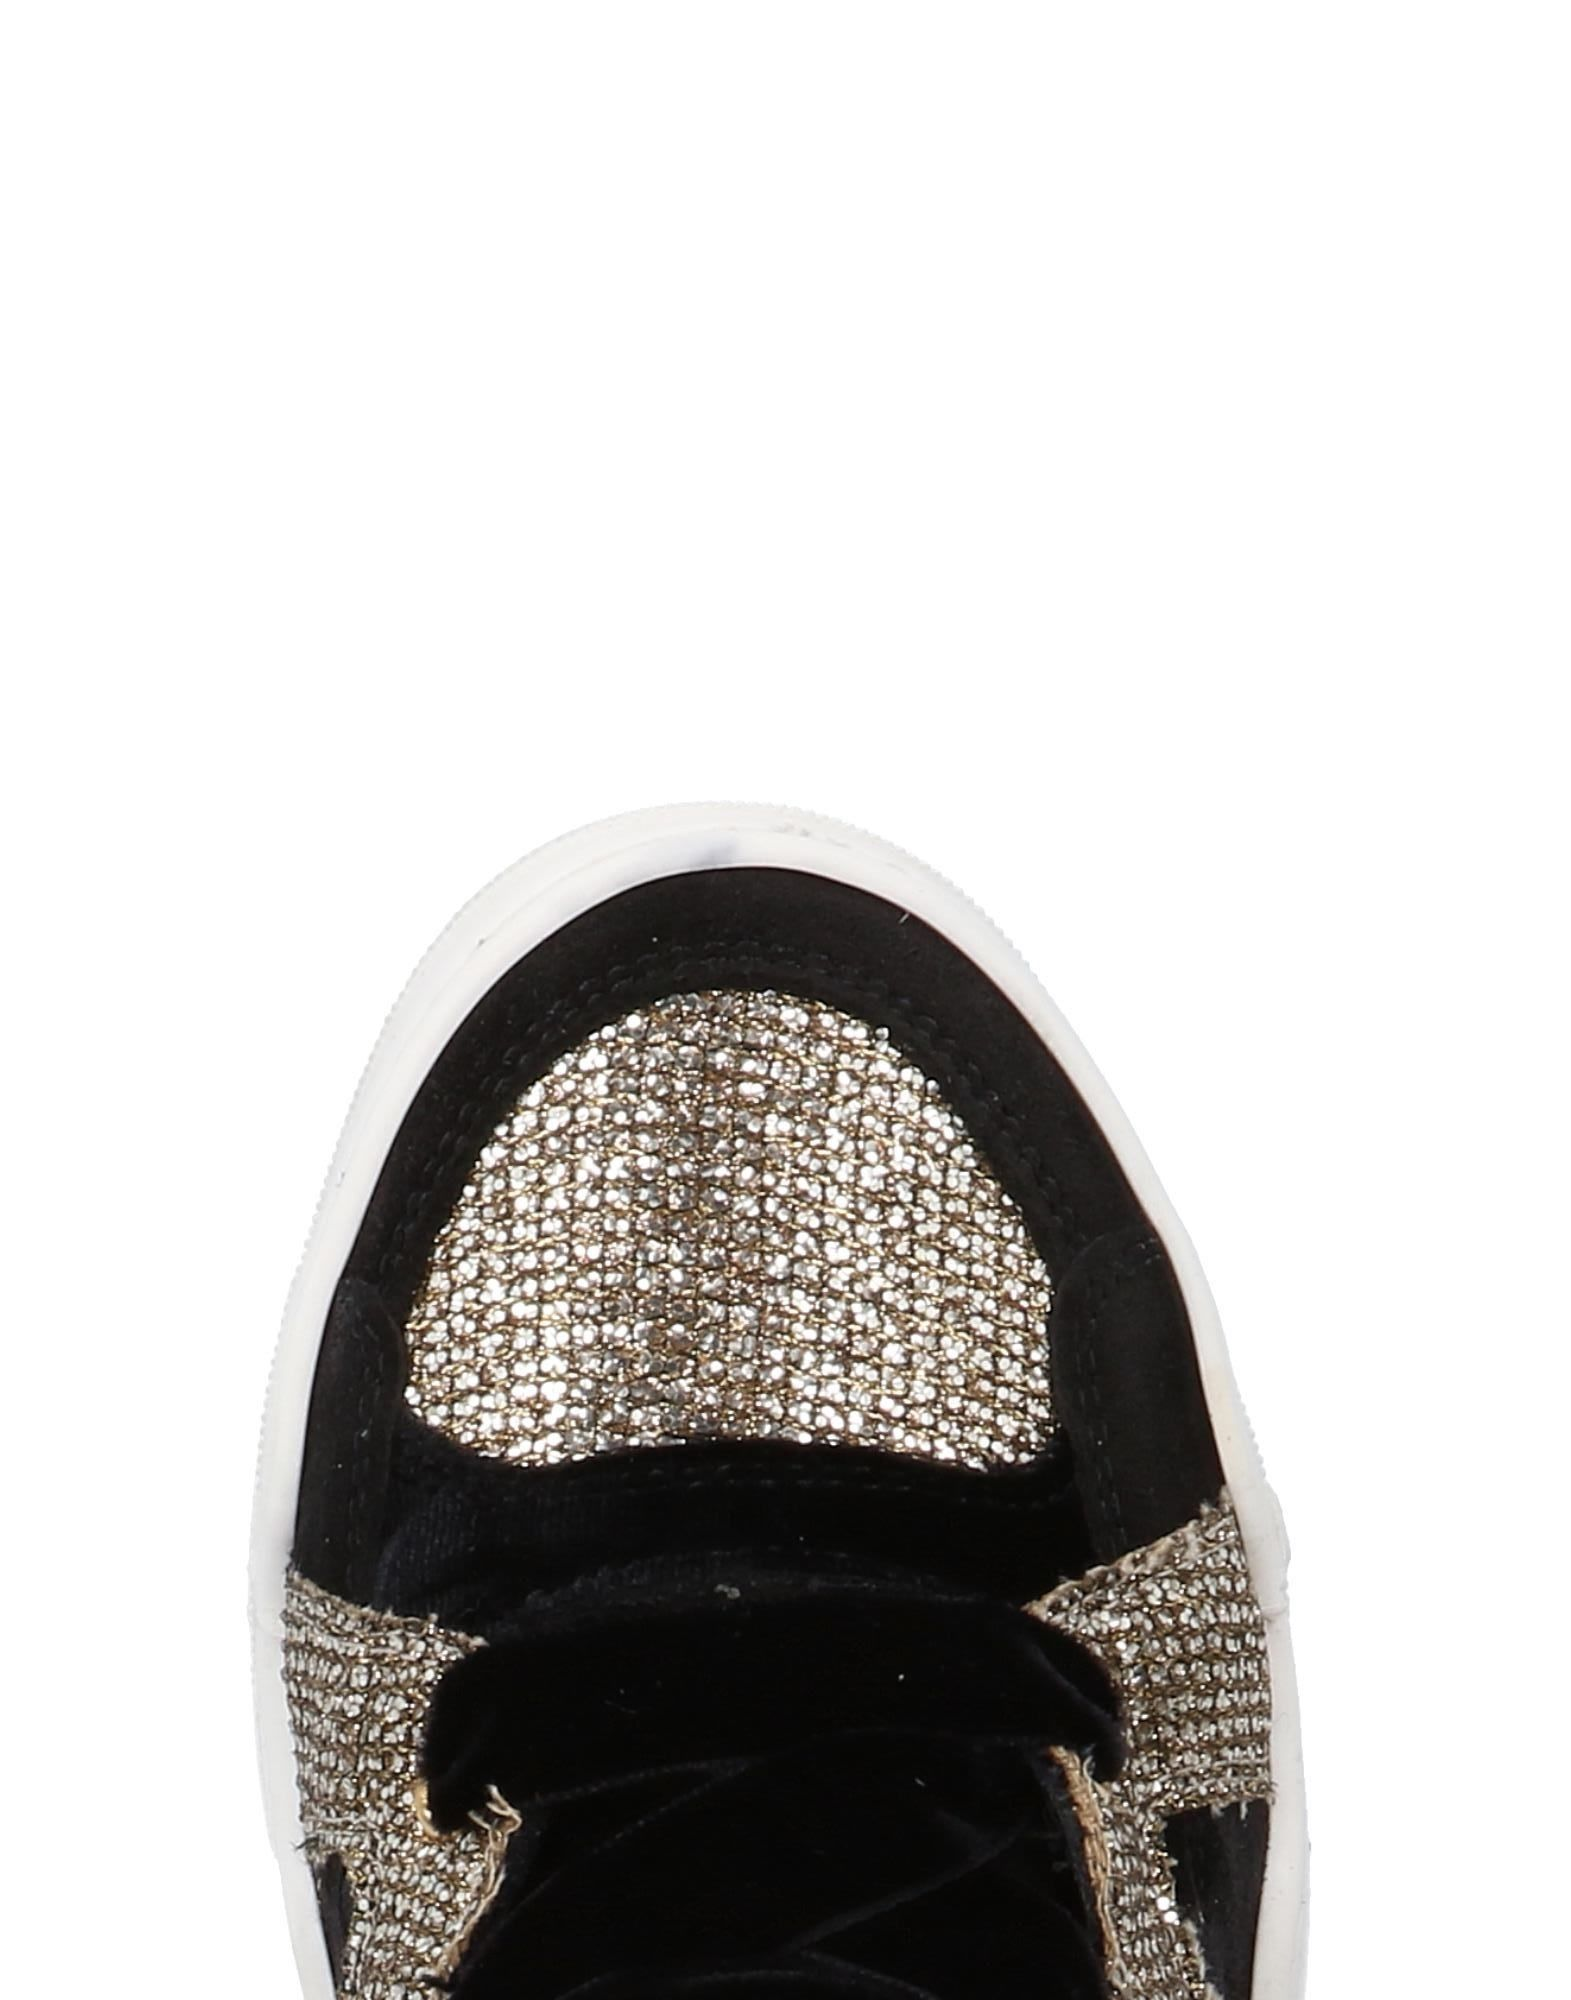 Tipe 11498843LP E Tacchi Sneakers Damen  11498843LP Tipe Gute Qualität beliebte Schuhe b78221